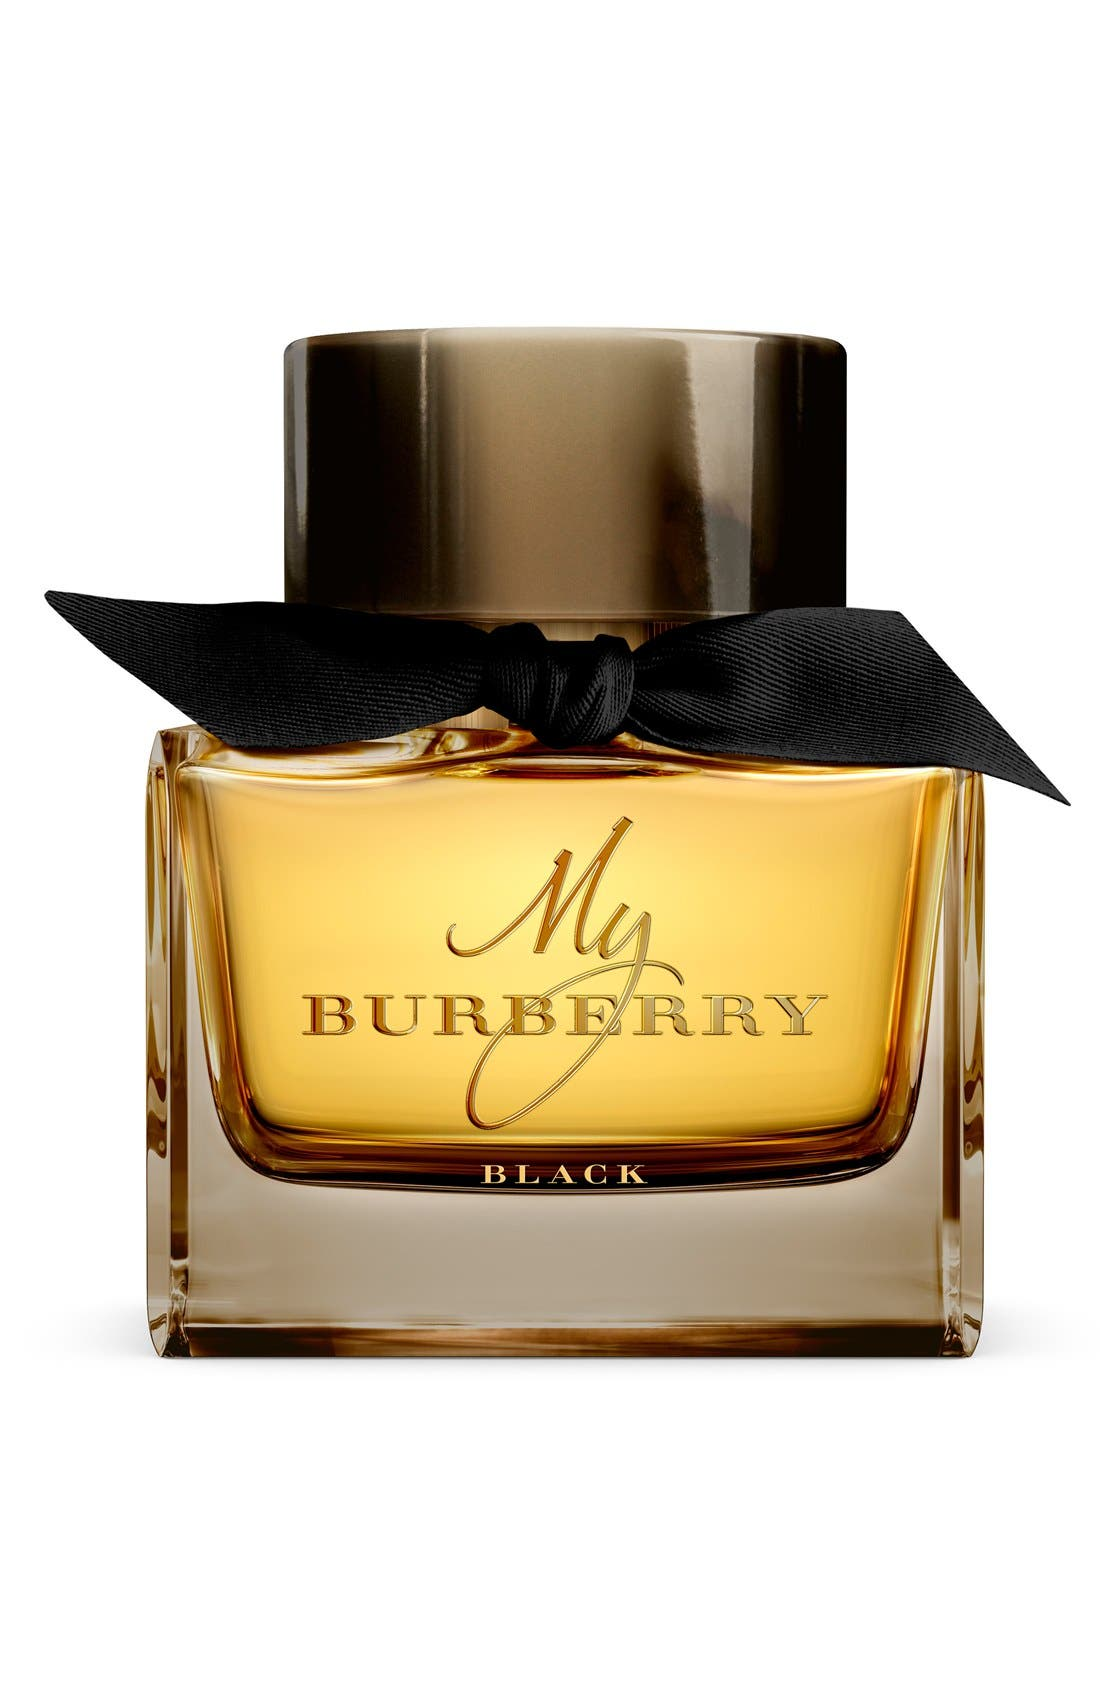 Burberry My Burberry Black Parfum Spray